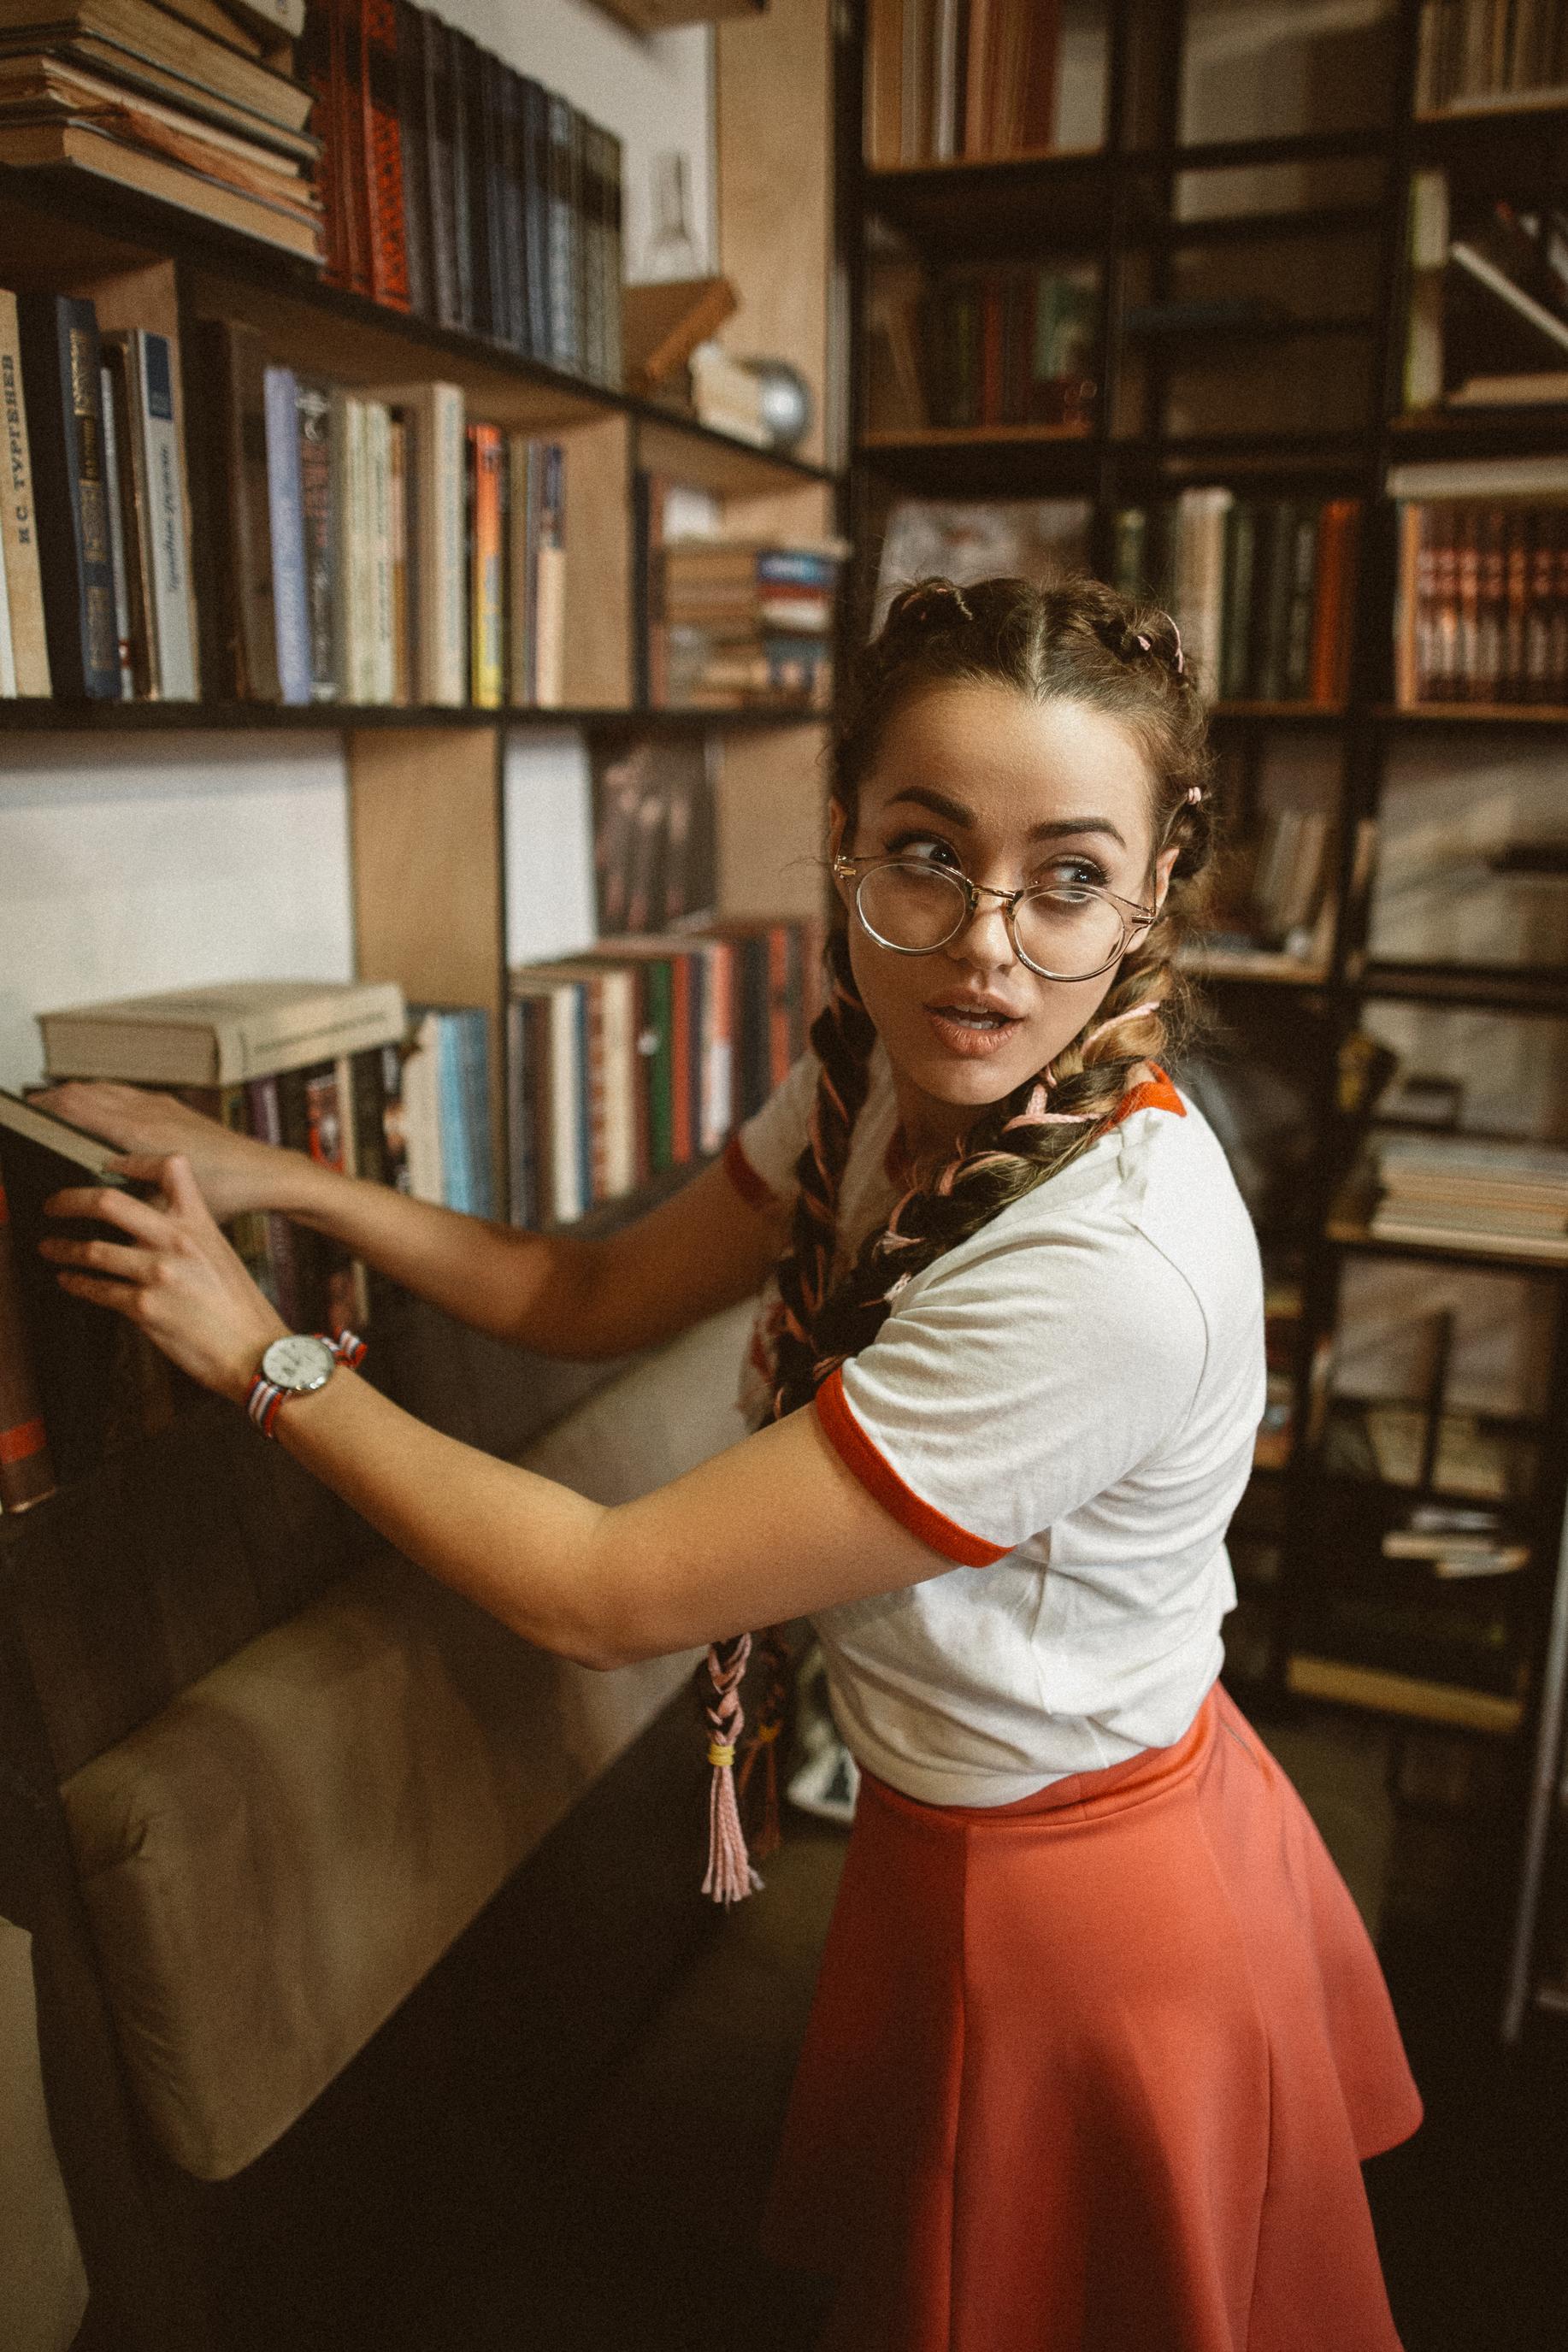 People 1834x2751 bookshelves books book store women women with glasses braids braided hair